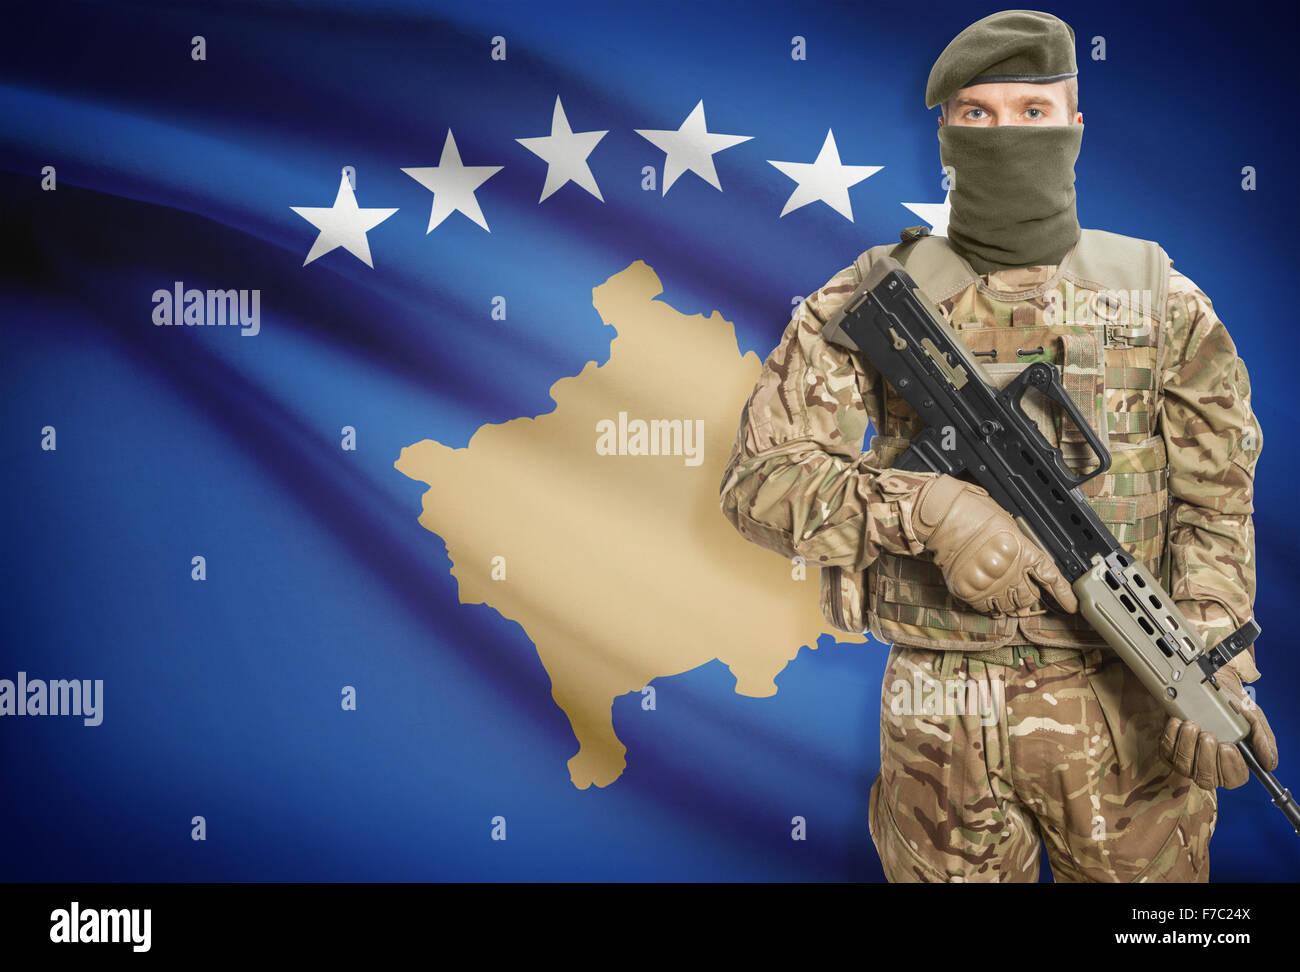 Soldier holding machine gun with national flag on background - Kosovo Stock Photo